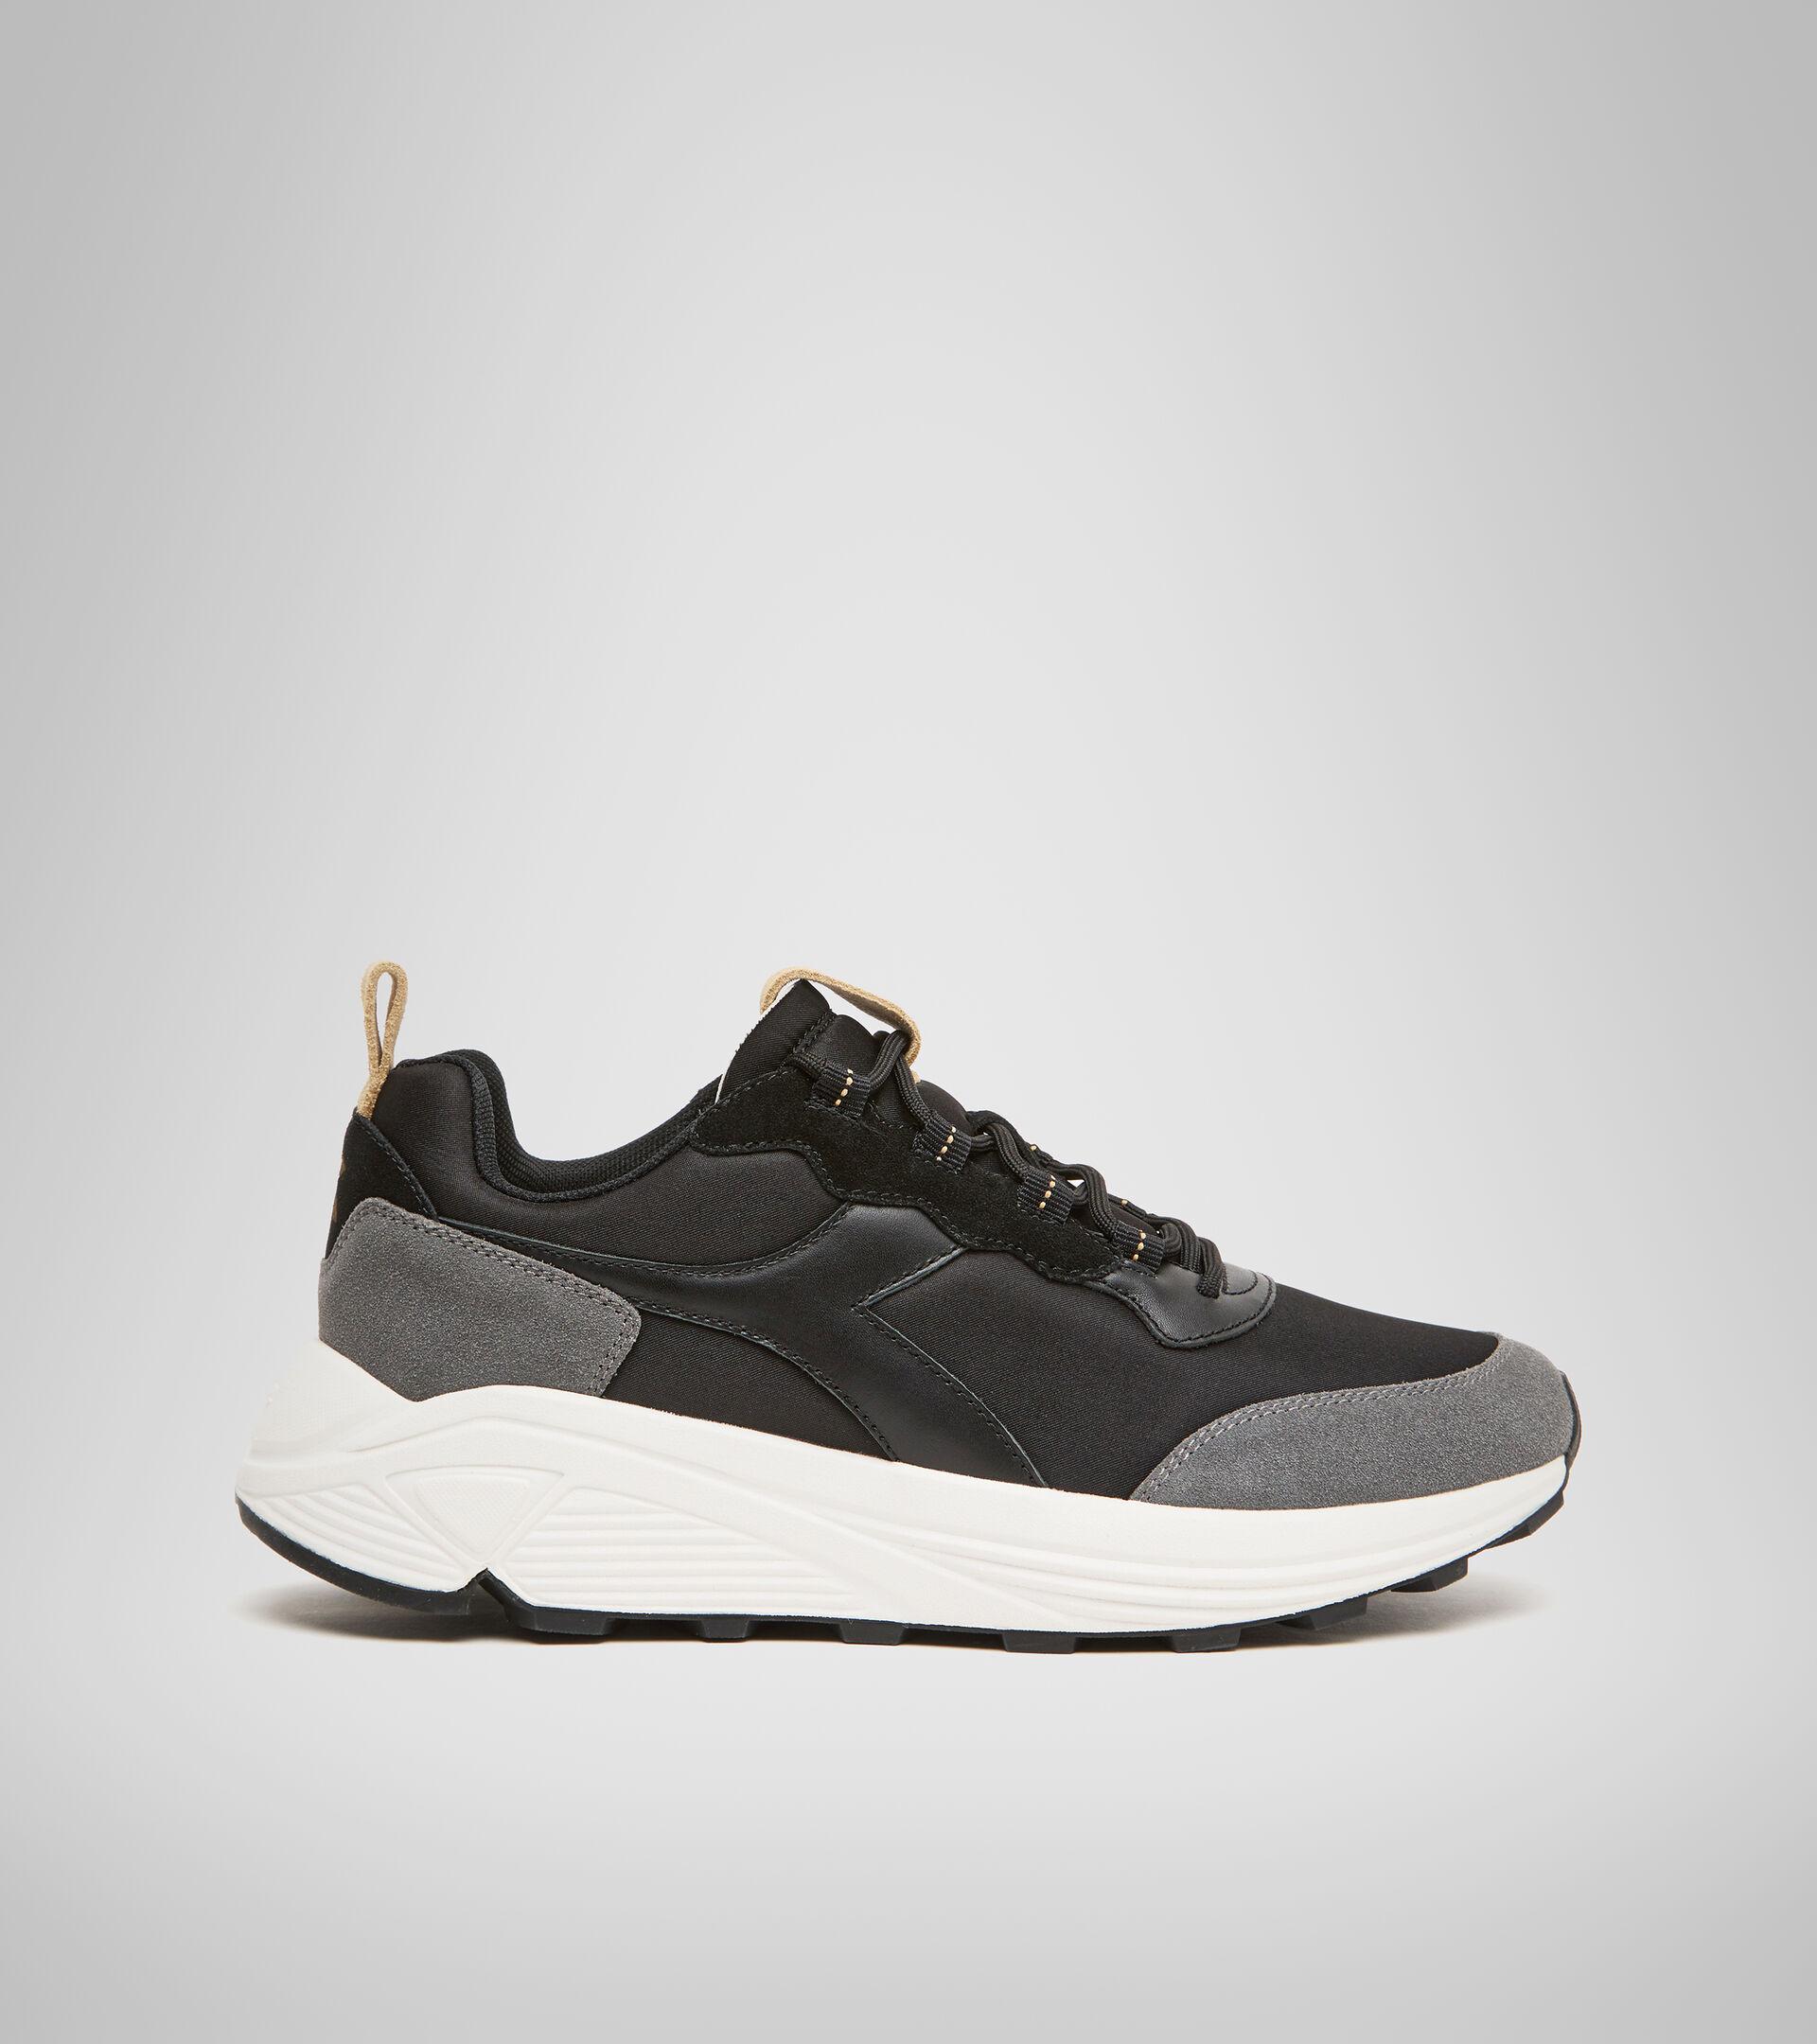 Footwear Sportswear UNISEX RAVE FULL GRAIN SUEDE BLACK Diadora